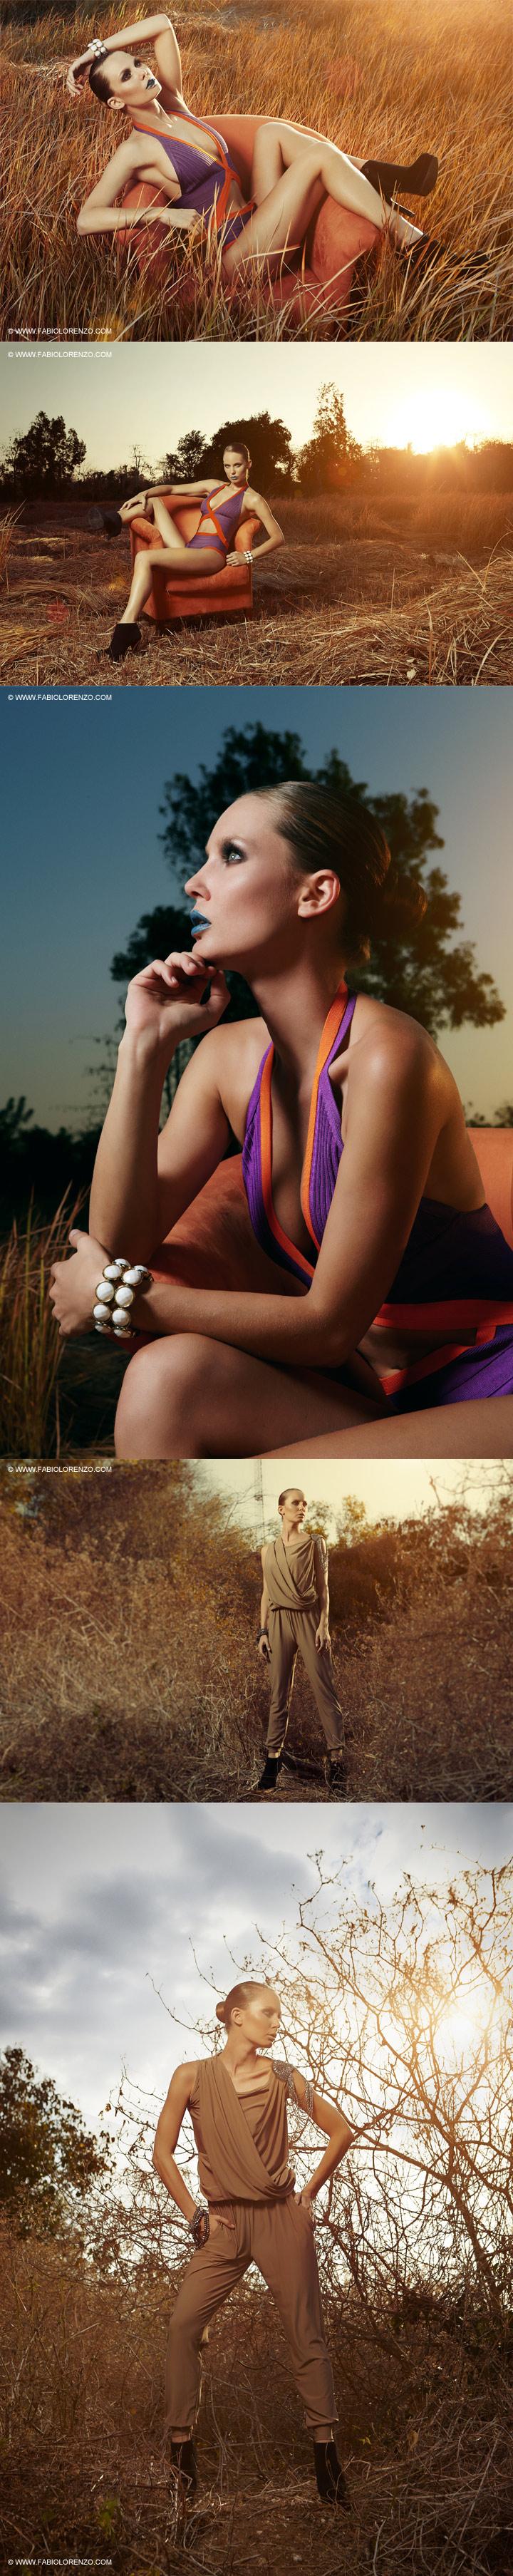 Male model photo shoot of Fabio Lorenzo Supit in Bali